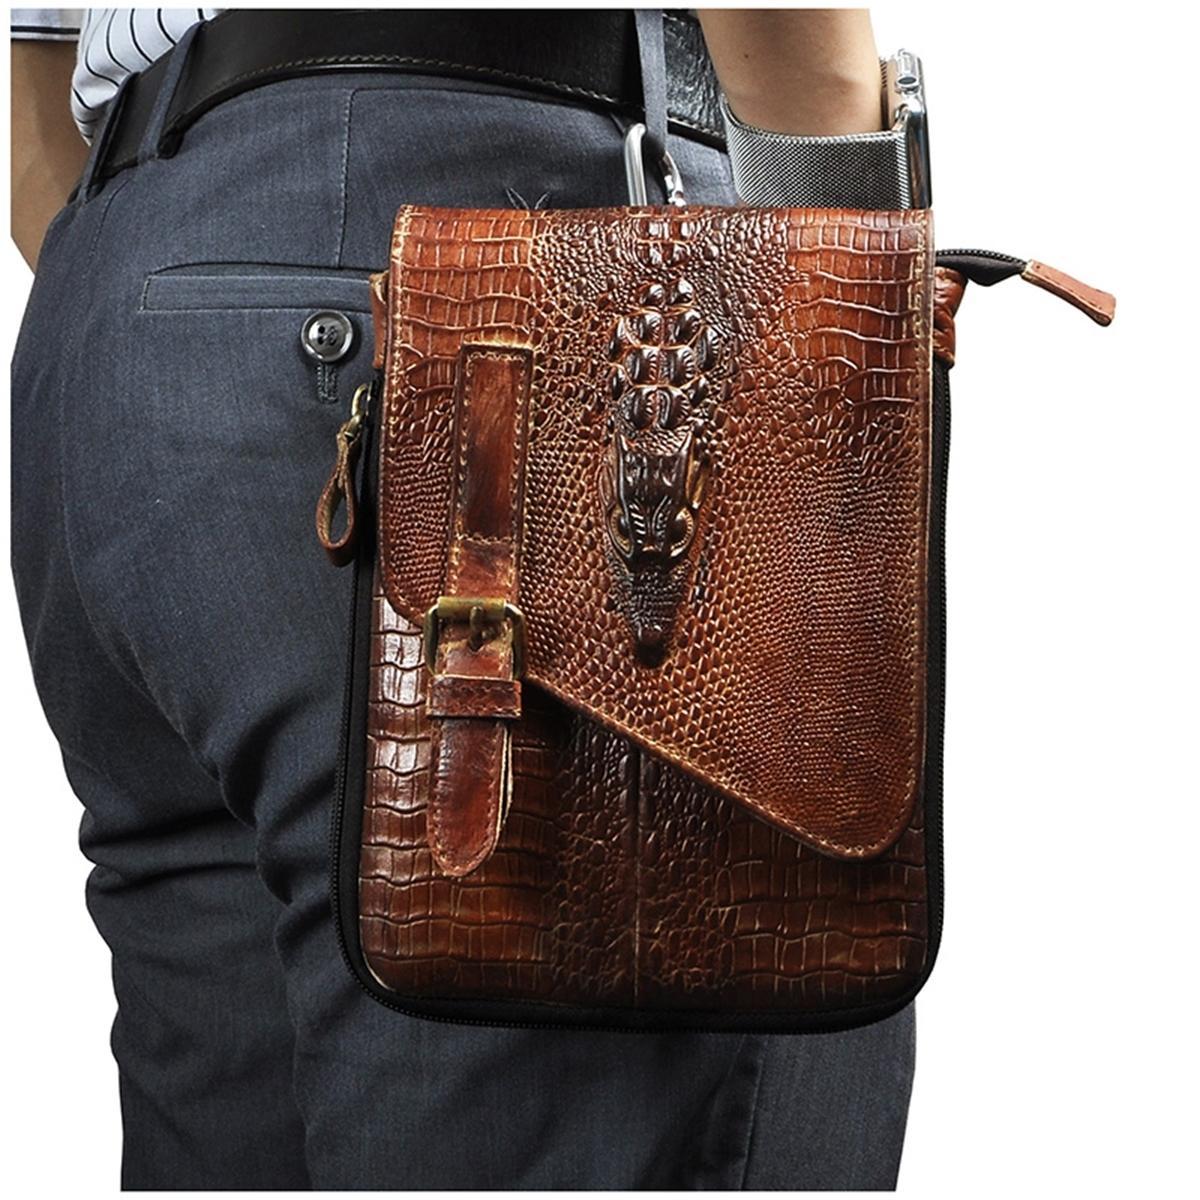 "Leather men Casual Design Multifunction Small Messenger Cross body Travel Fashion Waist Belt Pack 8"" Tablets Bag 611-1-b 201130"